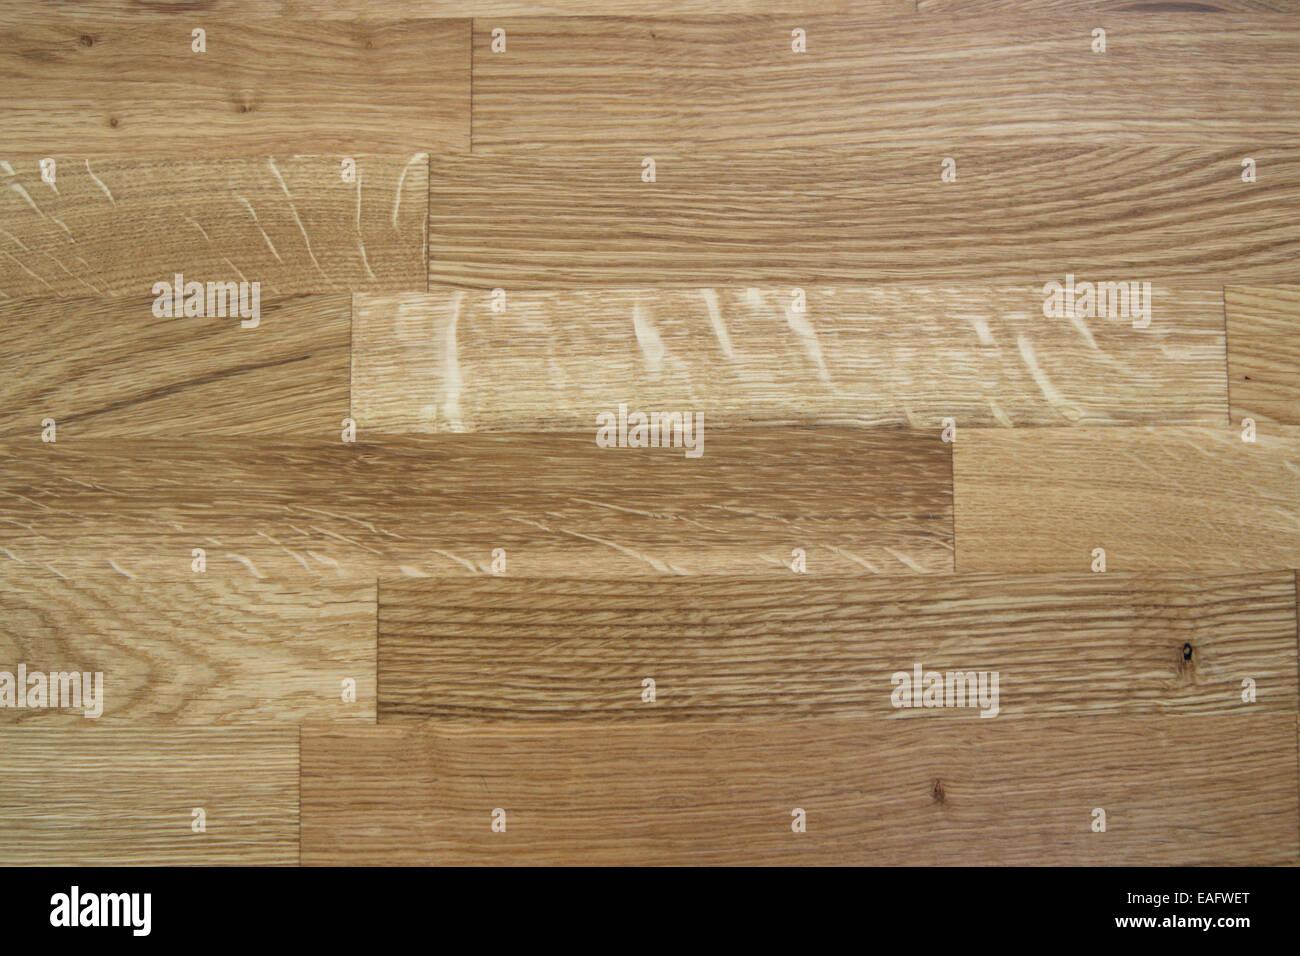 Holz Struktur holz holzbrett struktur maserung maser hoelzern holzstruktur stock